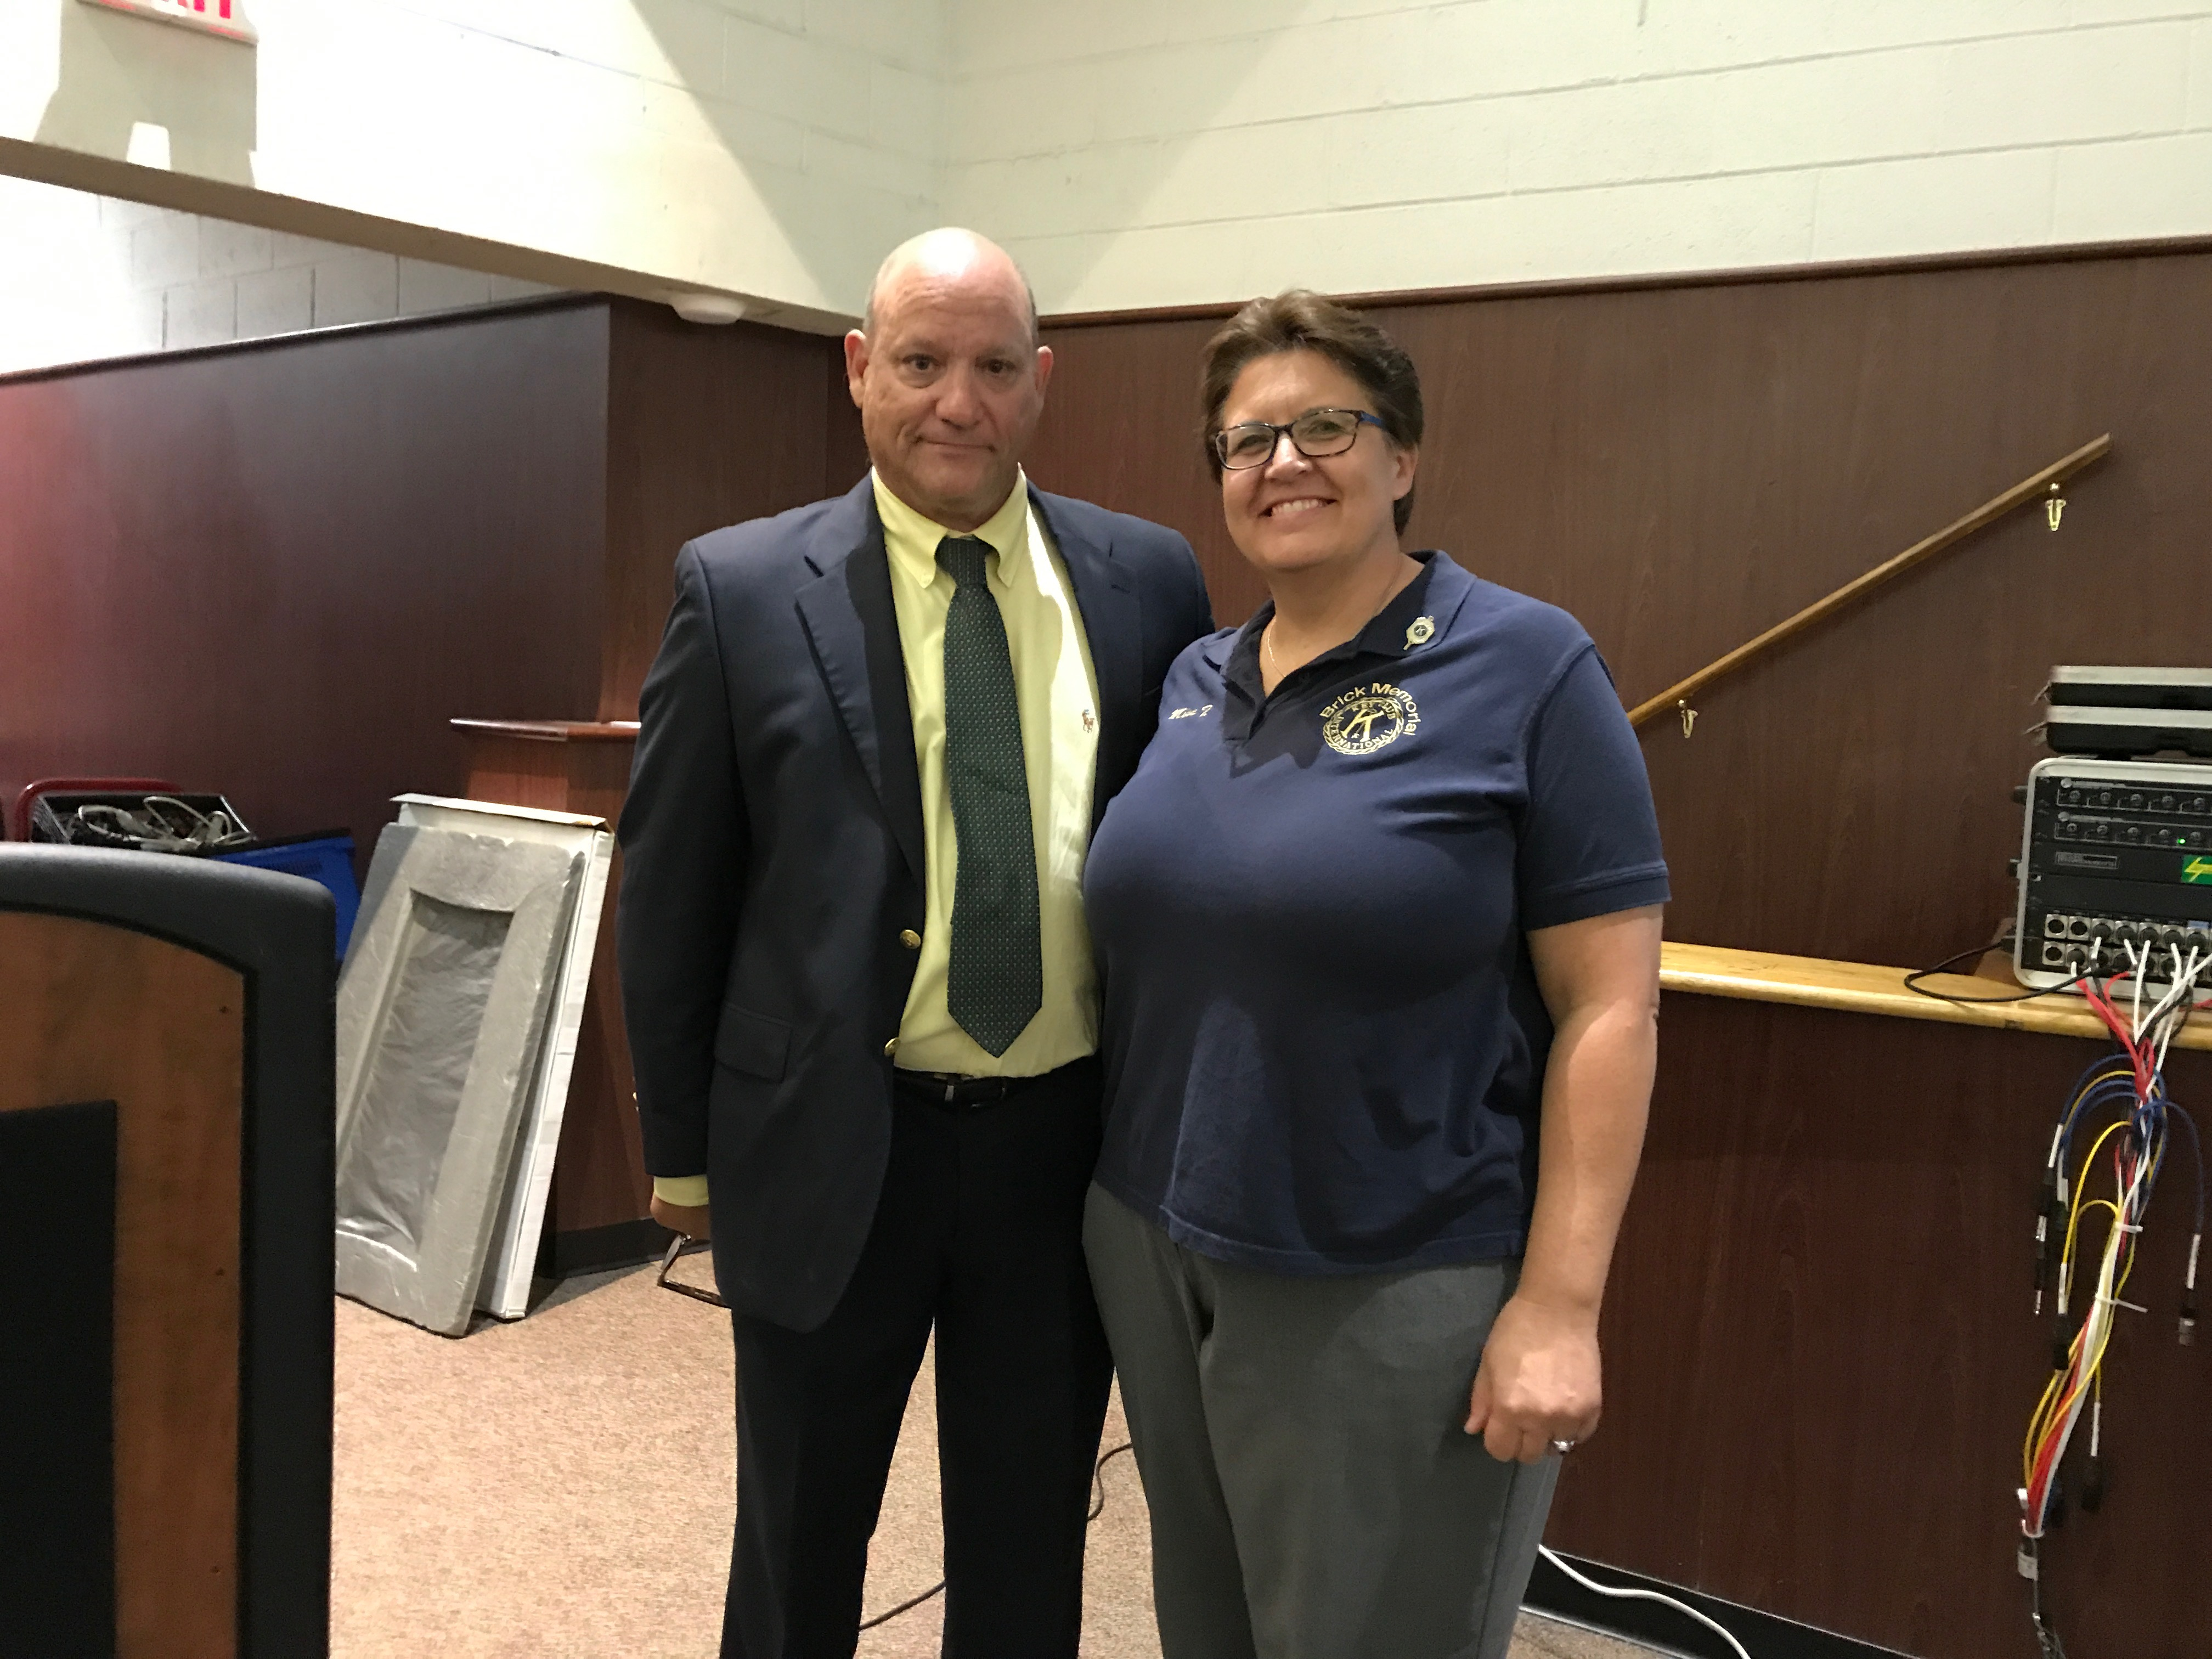 Brick schools superintendent Dennis Filippone and BMHS teacher Ann Marie Tarnowski (Photo: Daniel Nee)